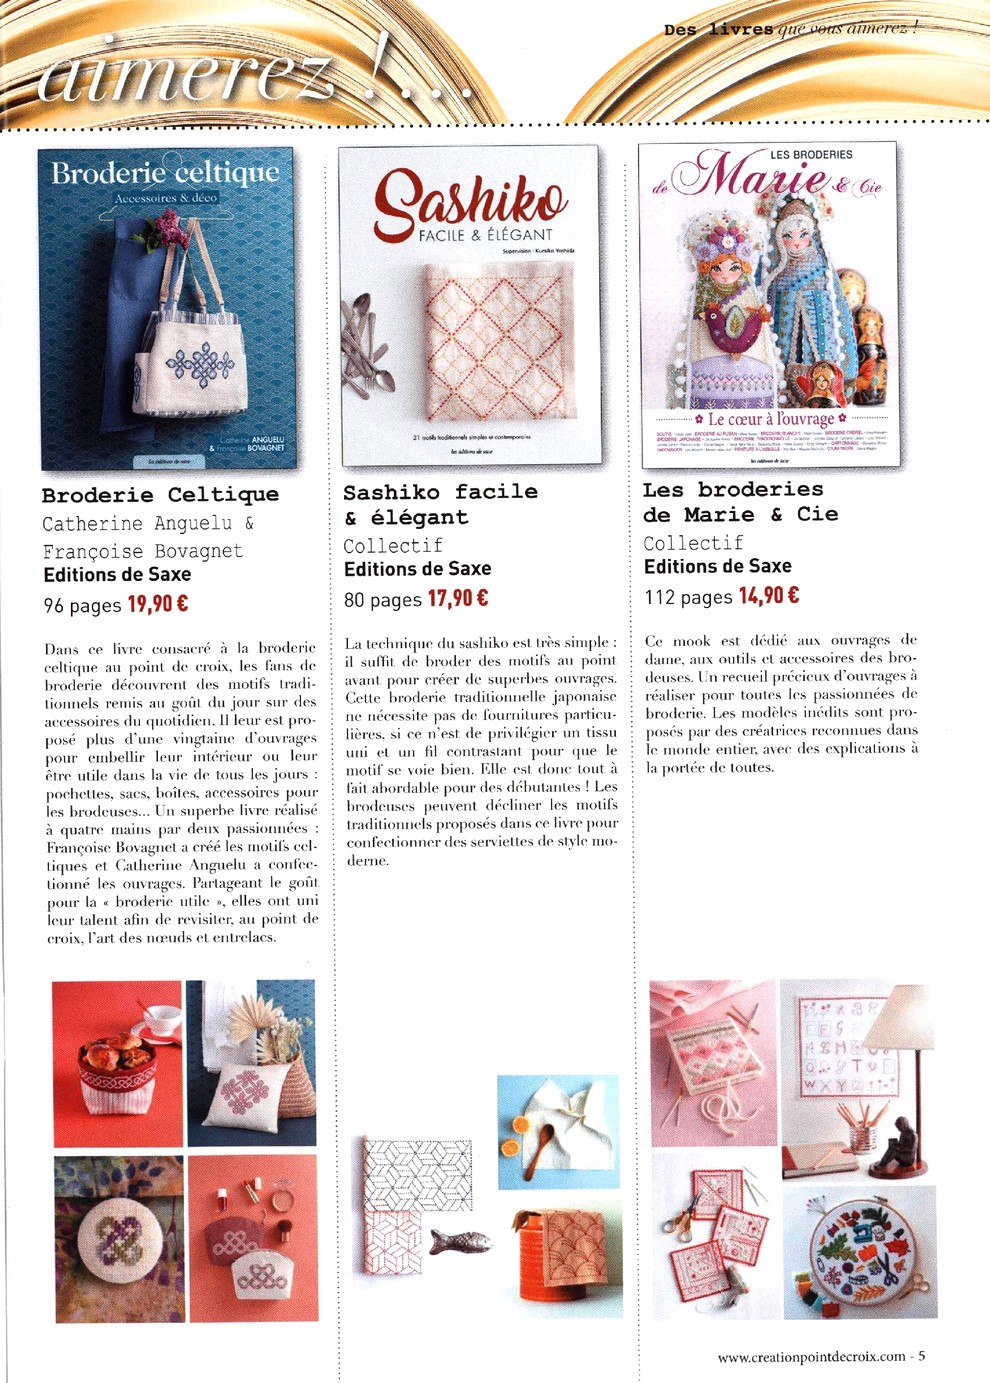 Журнал со схемами вышивки - Creation Point De Croix №78 2019 (5)